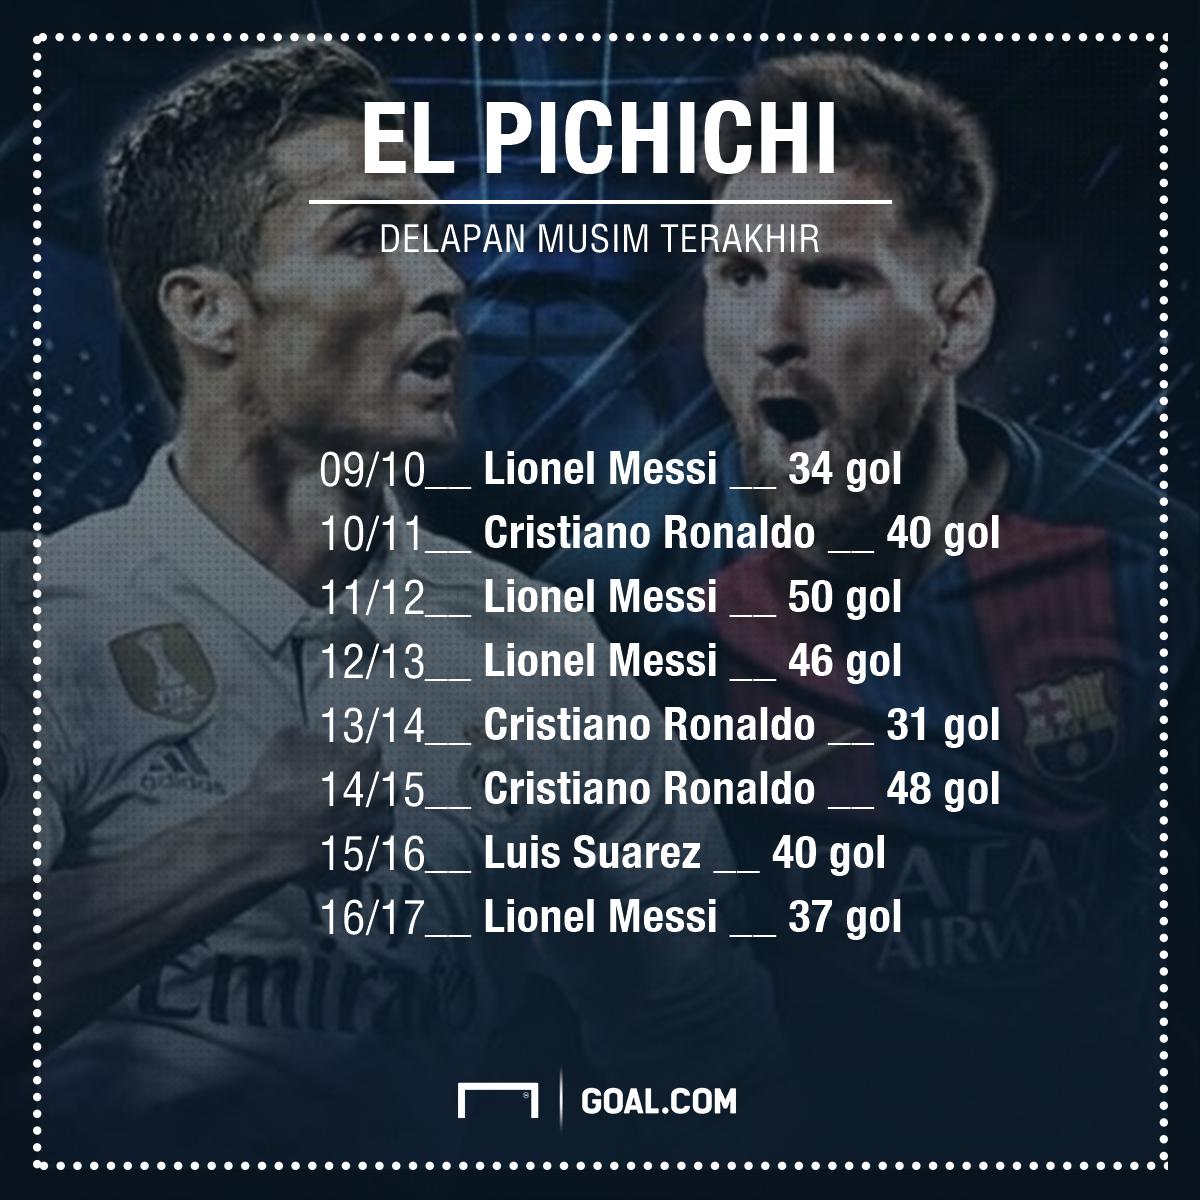 Lionel Messi Rebut El Pichichi, Cristiano Ronaldo Ukir